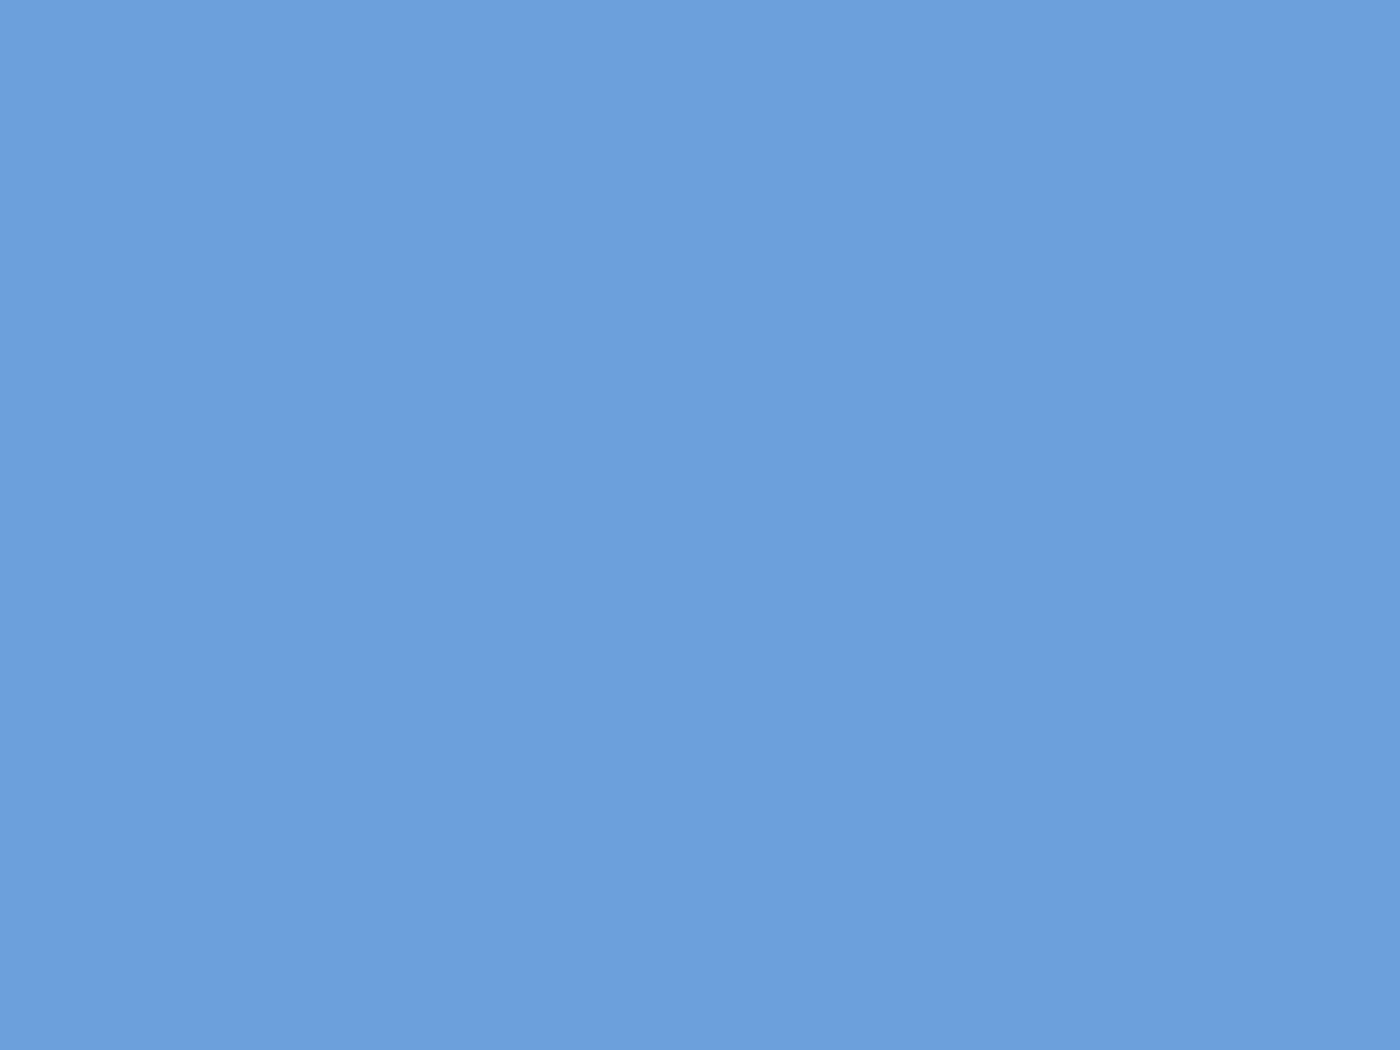 1400x1050 Little Boy Blue Solid Color Background